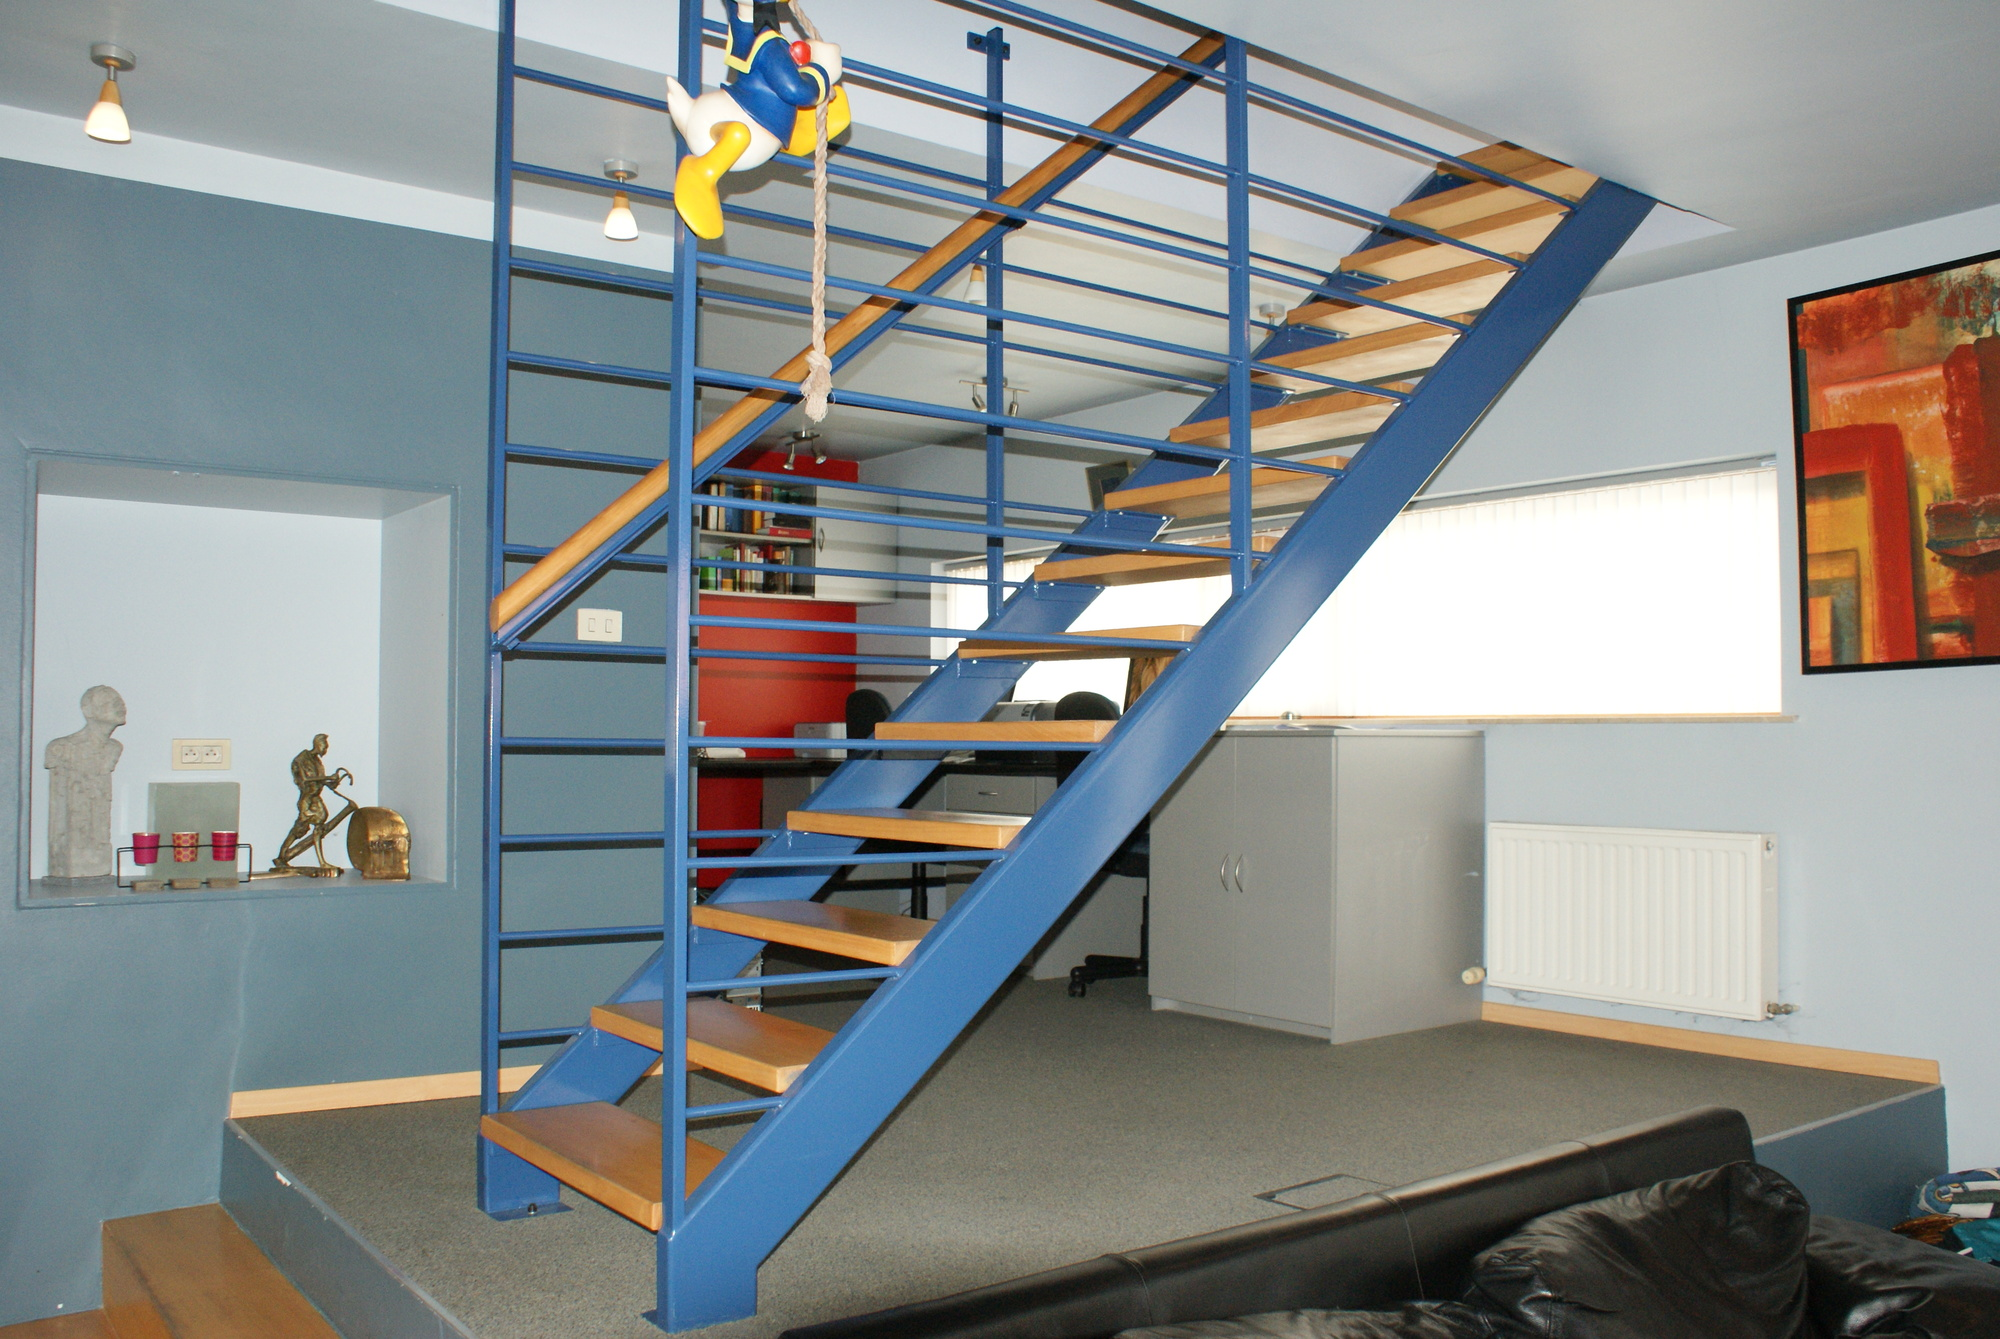 Trappen bilzen limburg metaalwerken - Binnen trap ...